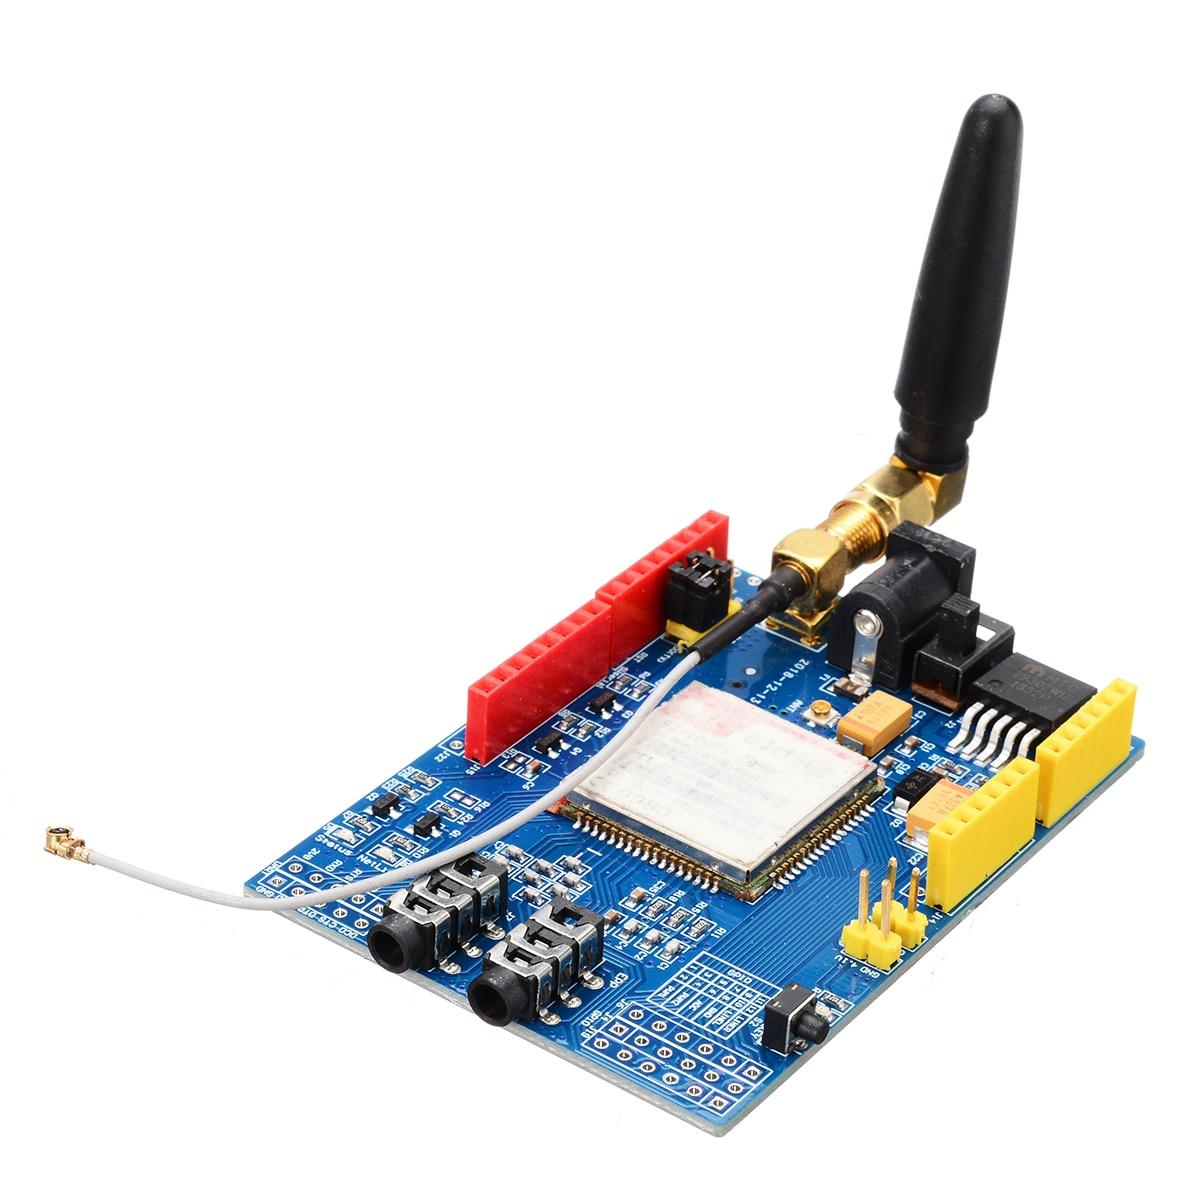 Data Transfer Wireless Module GPRS/GSM Development Board Module SIM900 850/900/1800 MHz Kit For Arduino Electronic Components